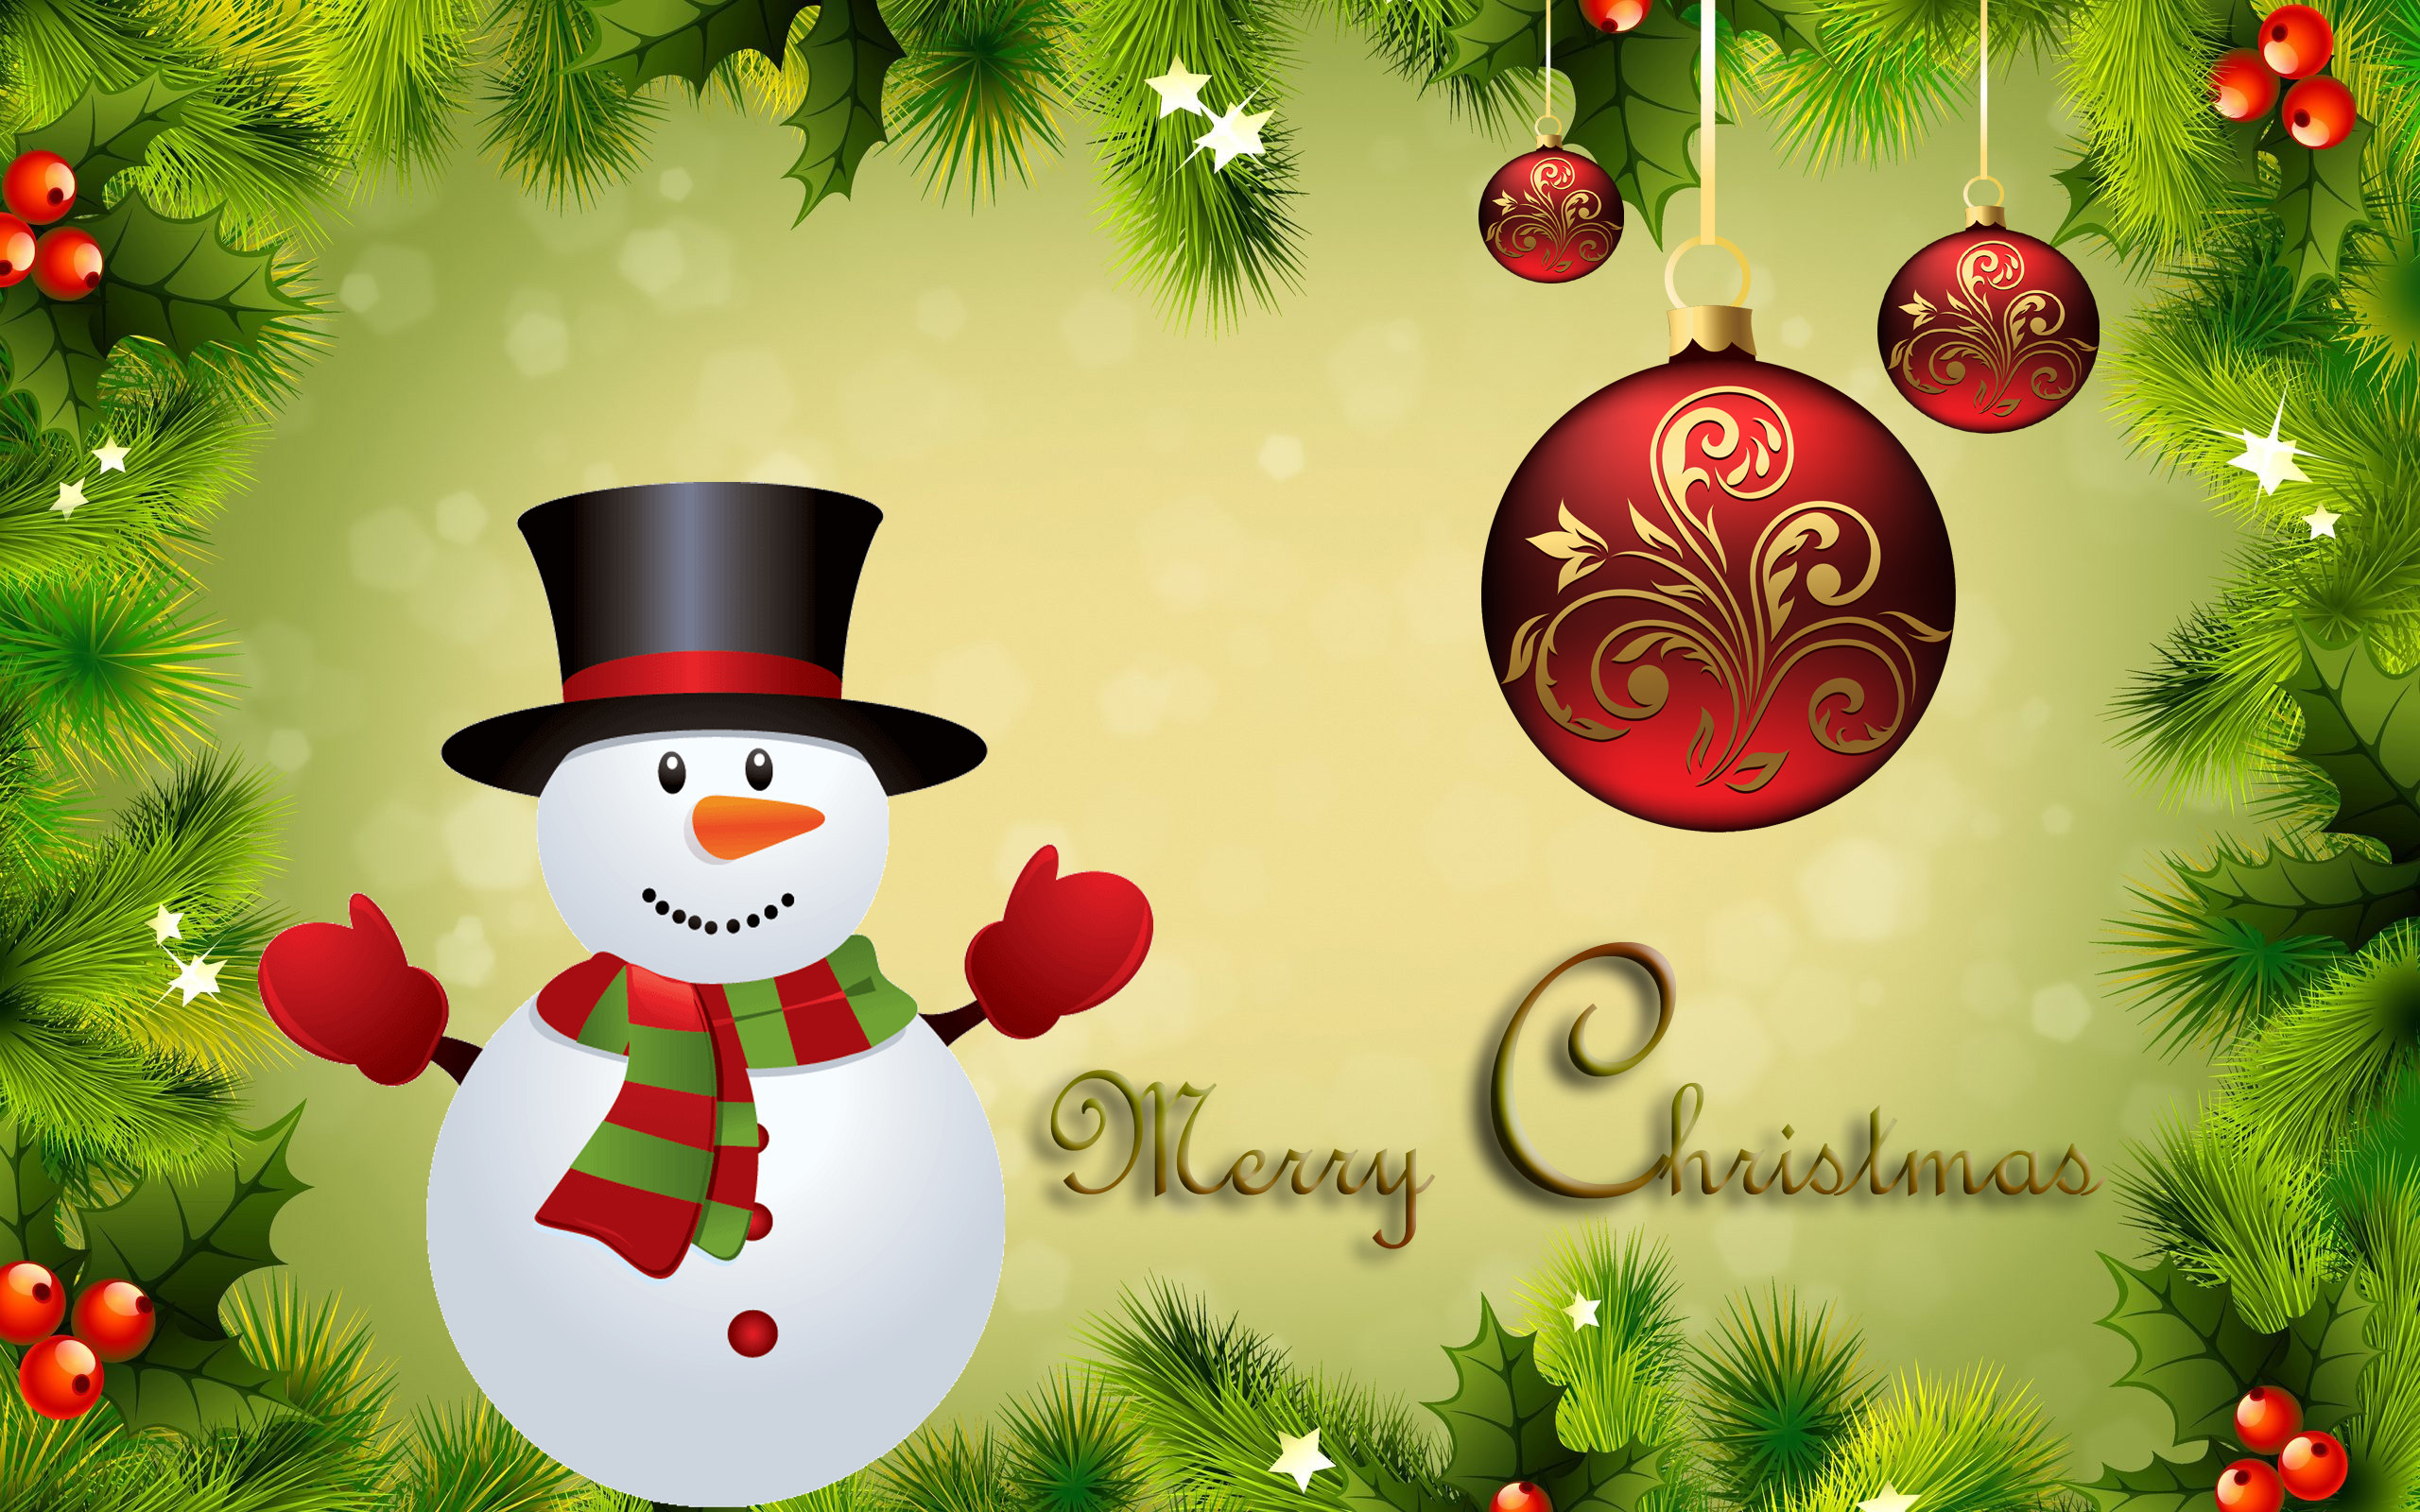 Cute Christmas Wallpapers Hd - Cute Wallpaper Cute Merry Christmas , HD Wallpaper & Backgrounds